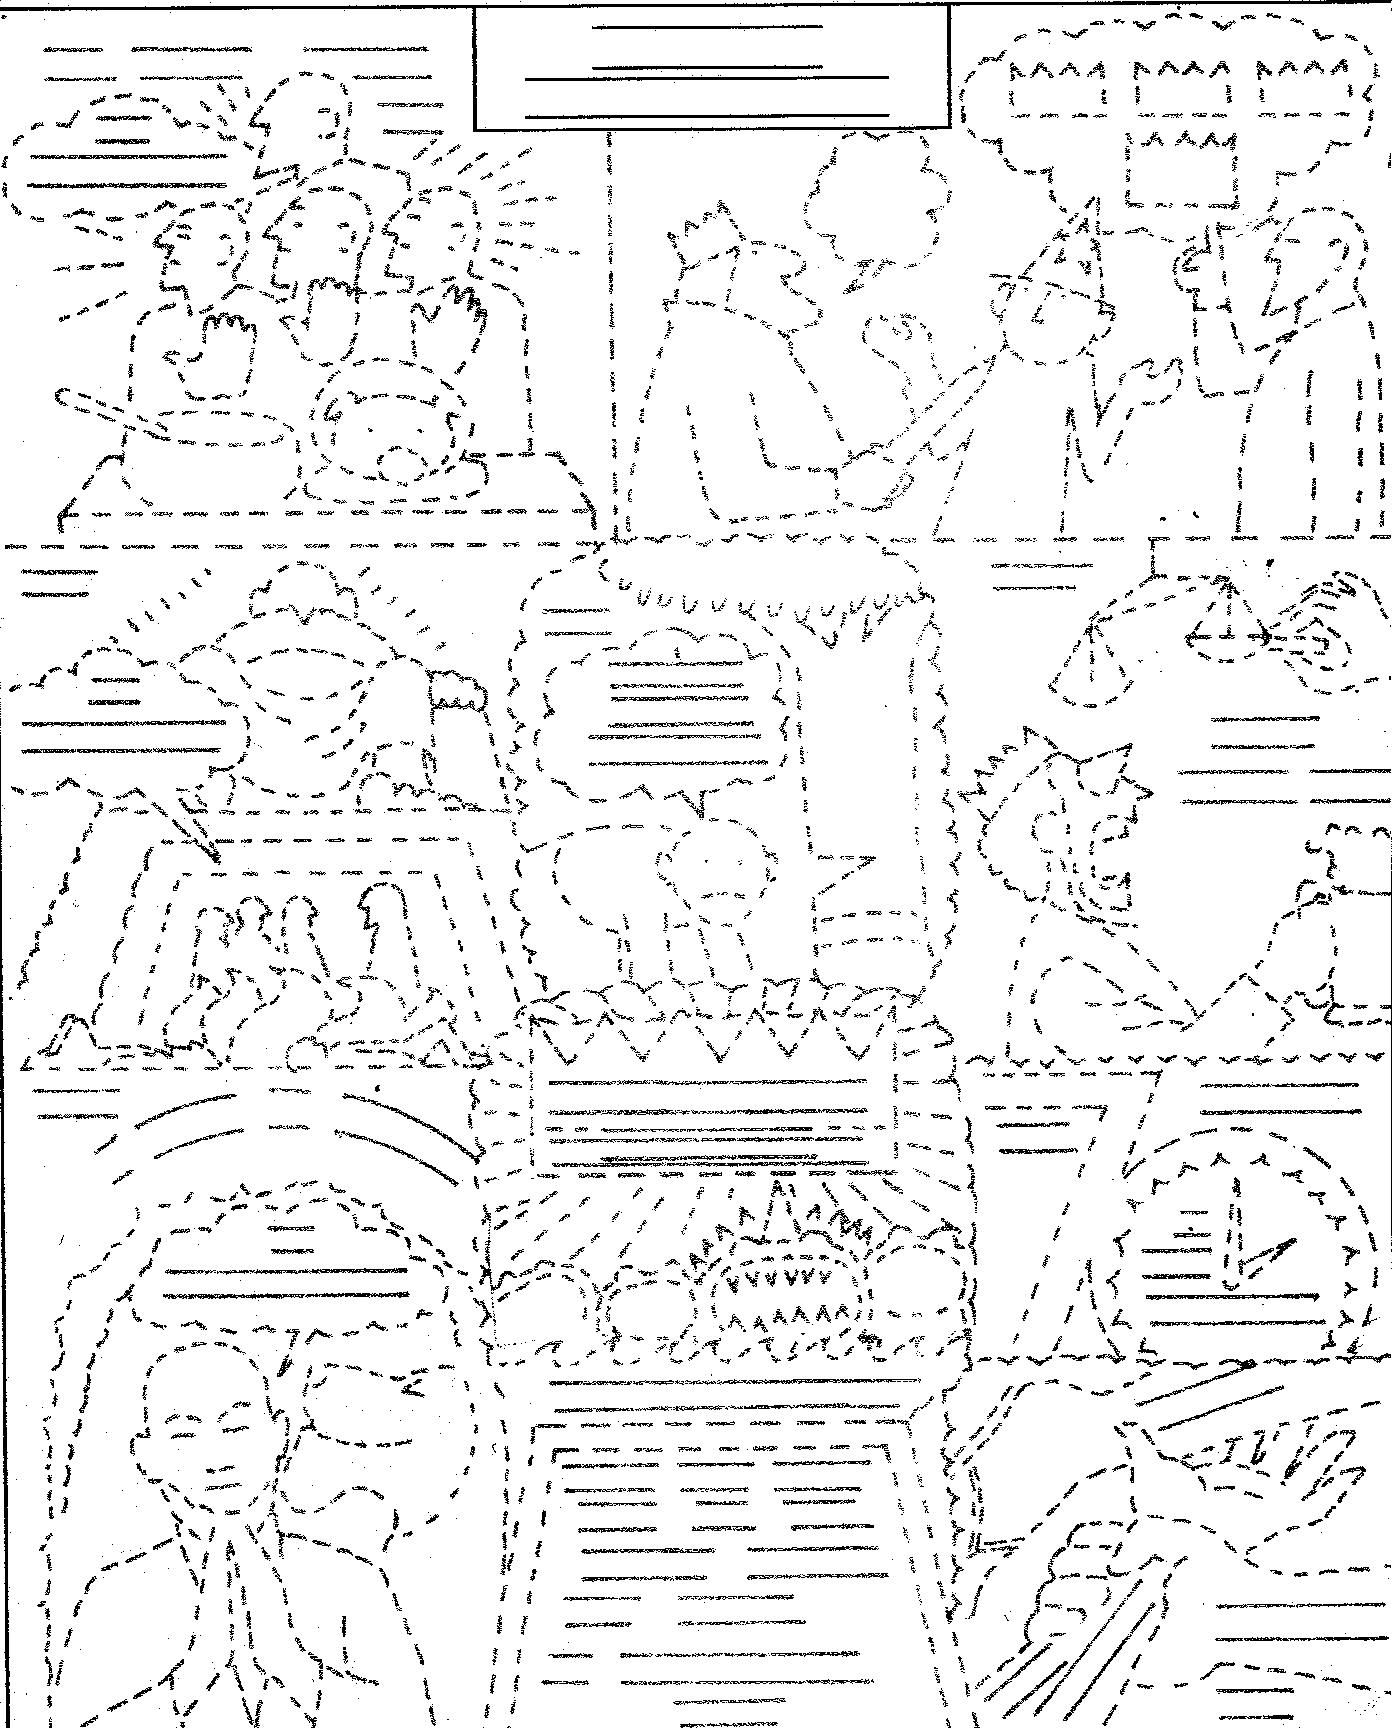 blog bible daniel 001 - Gideon Bible Story Coloring Pages